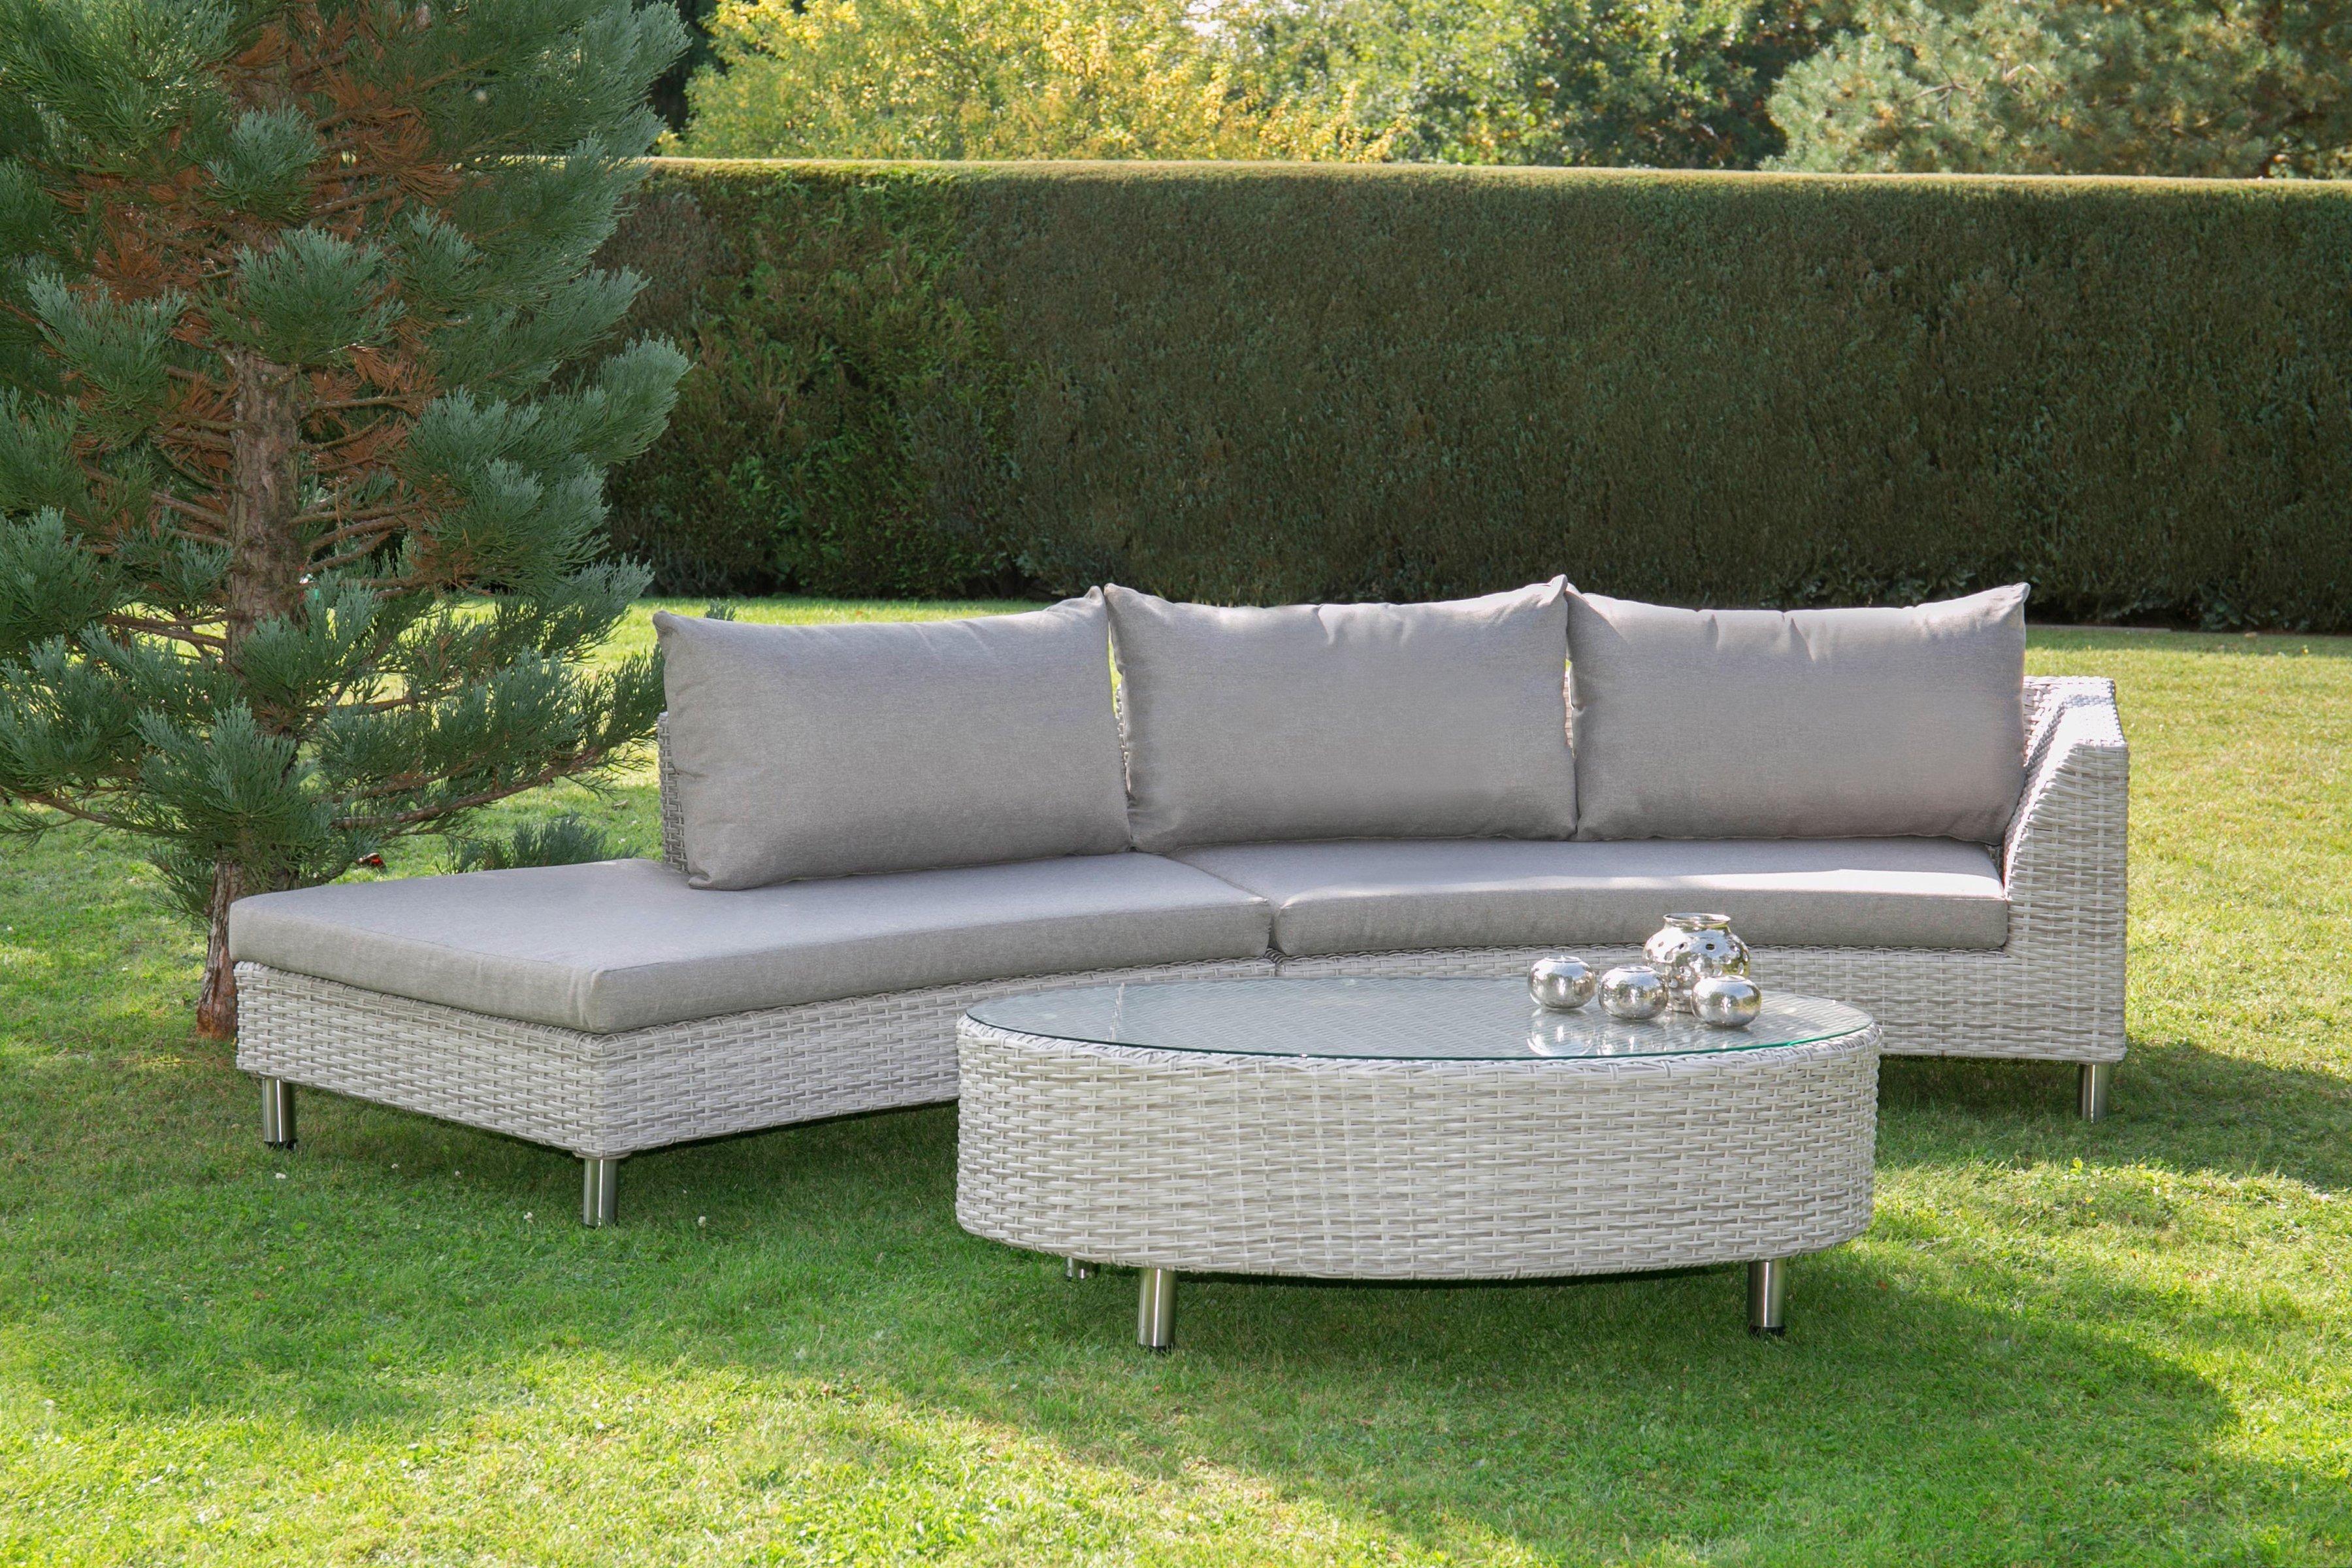 Bellasole Loungeset 8 Tlg 2 Banke Tisch 130x79 Cm Polyrattan Cremeweiss Lounge Mobel Loungemobel Garten Lounge